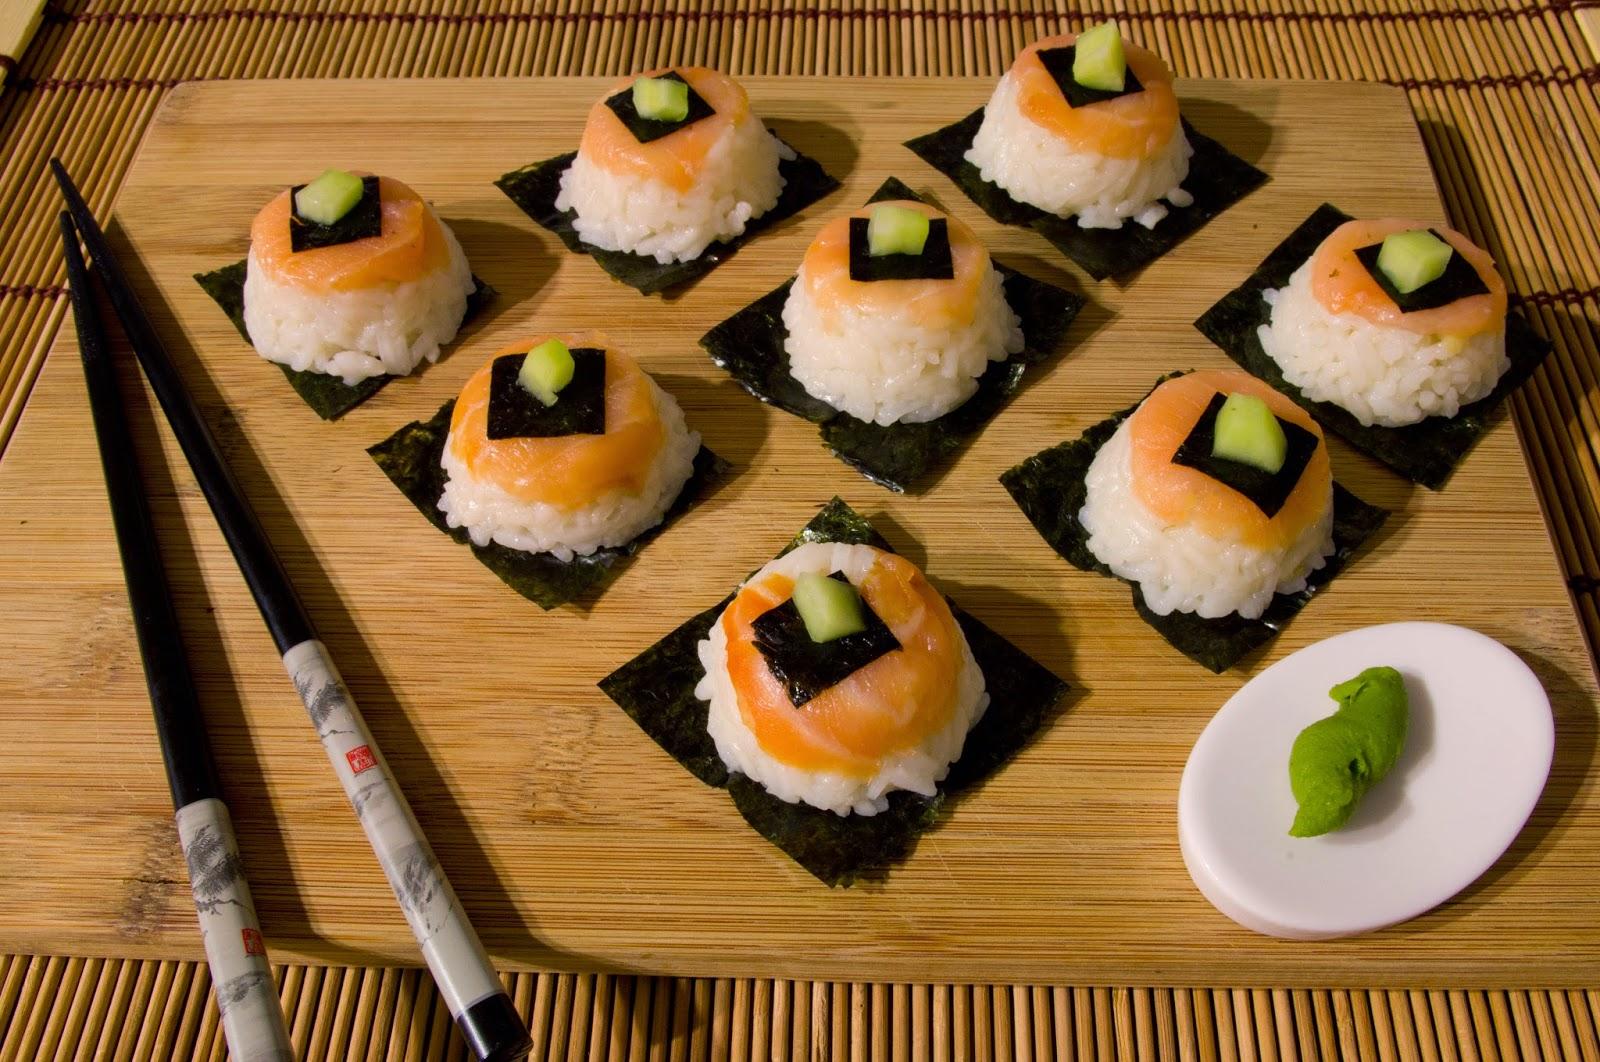 http://mojemenu.blogspot.com/2015/01/sushi-inaczej.html